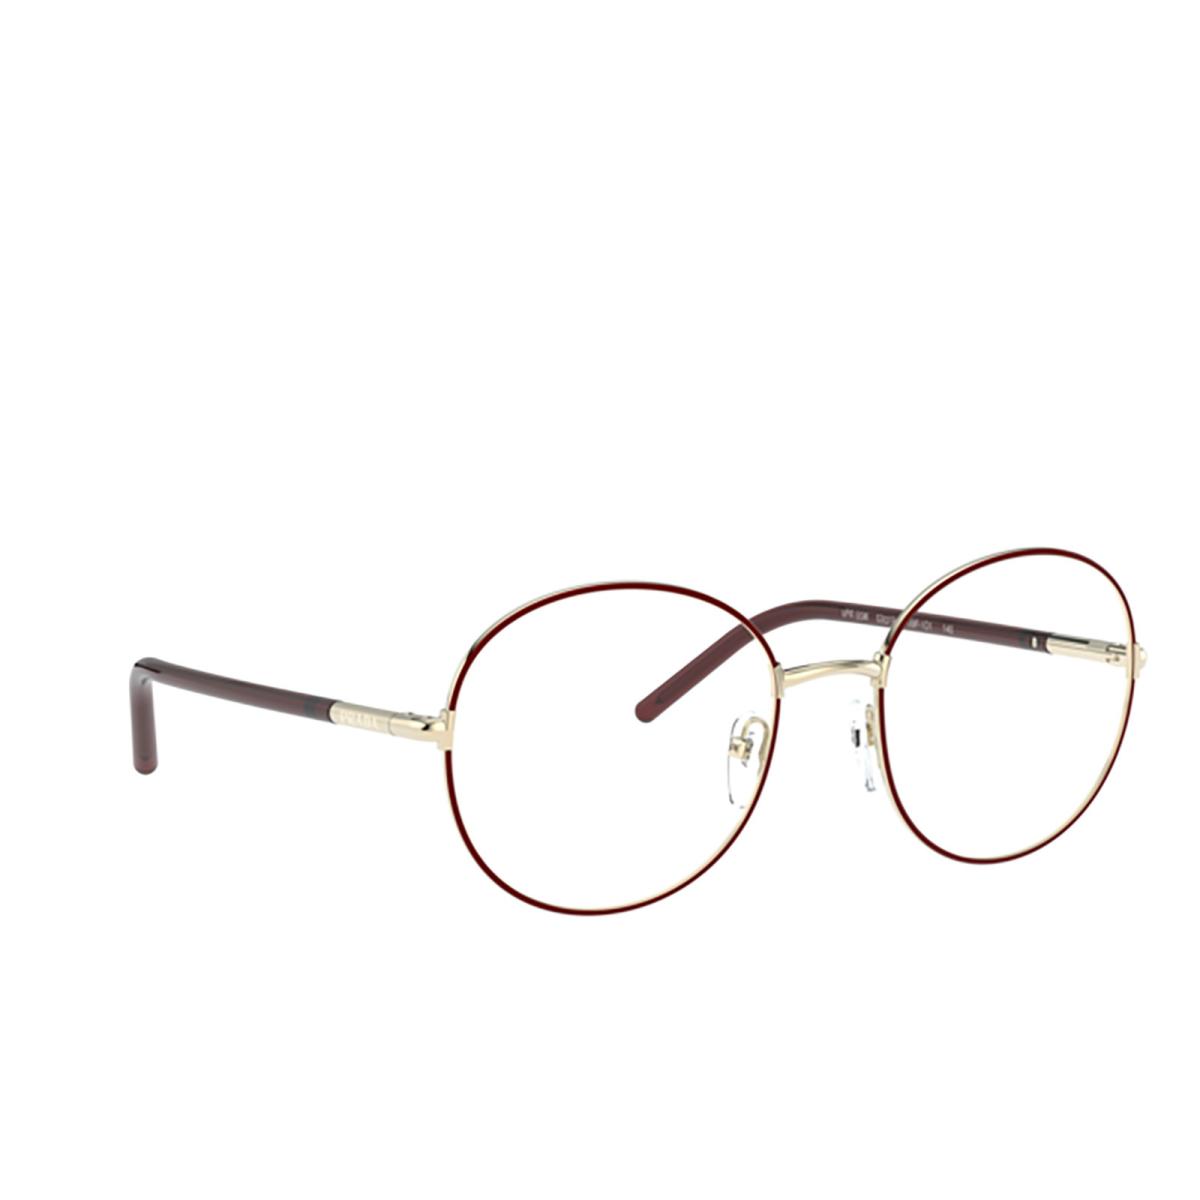 Prada® Round Eyeglasses: PR 55WV color Pale Gold / Bordeaux 09P1O1.